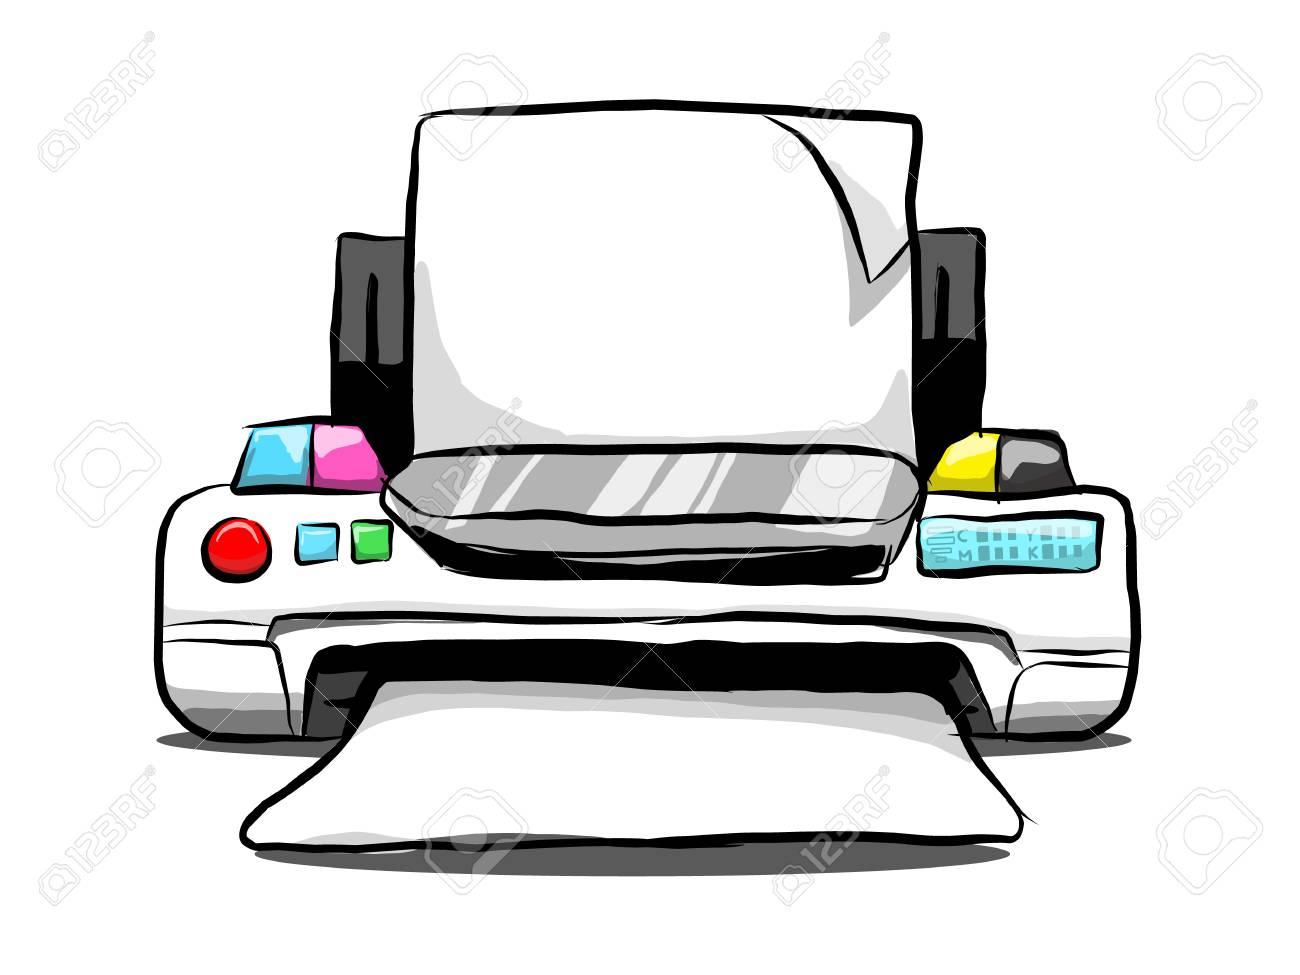 free hand drawing vector of desktop inkjet printer royalty free cliparts vectors and stock illustration image 125372736 free hand drawing vector of desktop inkjet printer